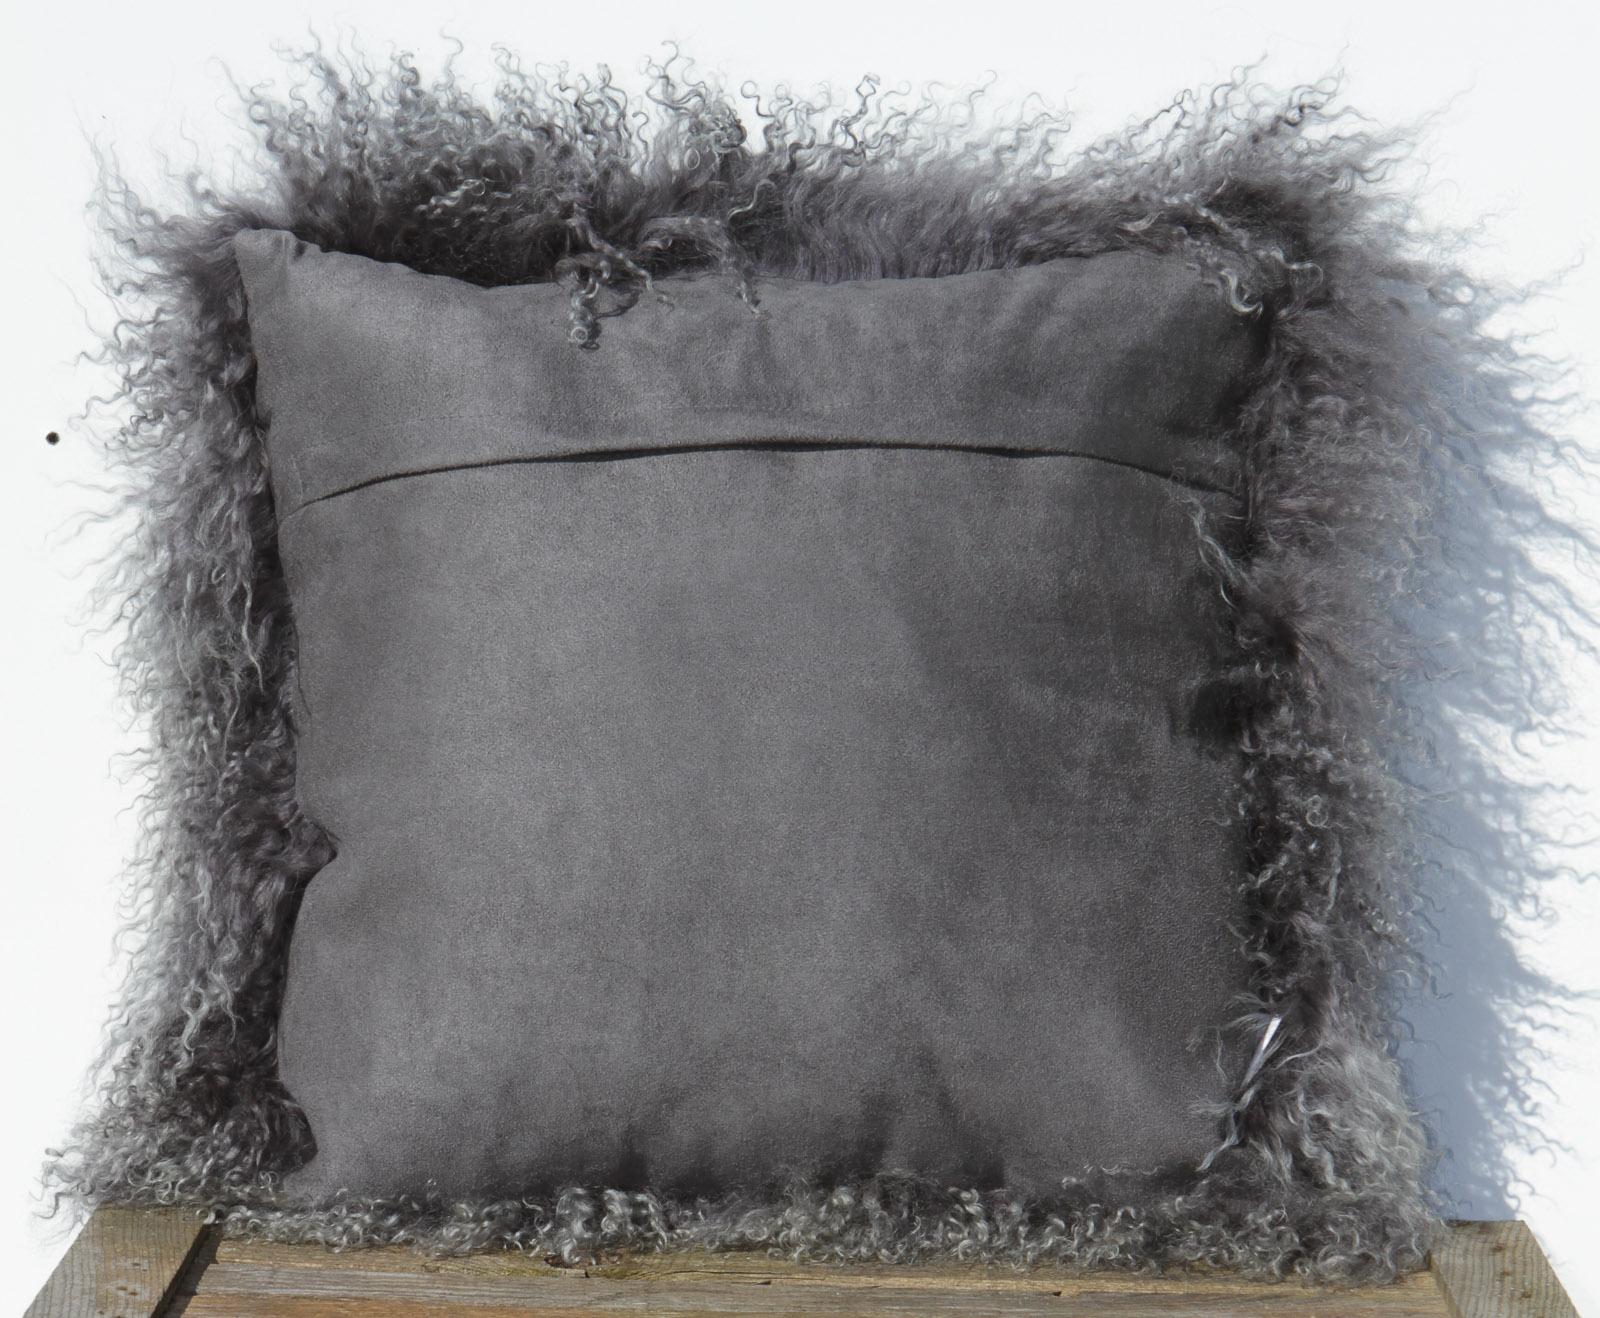 Tibet Lammfell Kissen Zottelkissen Sofakissen Fellkissen Schiefergrau 40 x 40 cm 40 x 40 cm